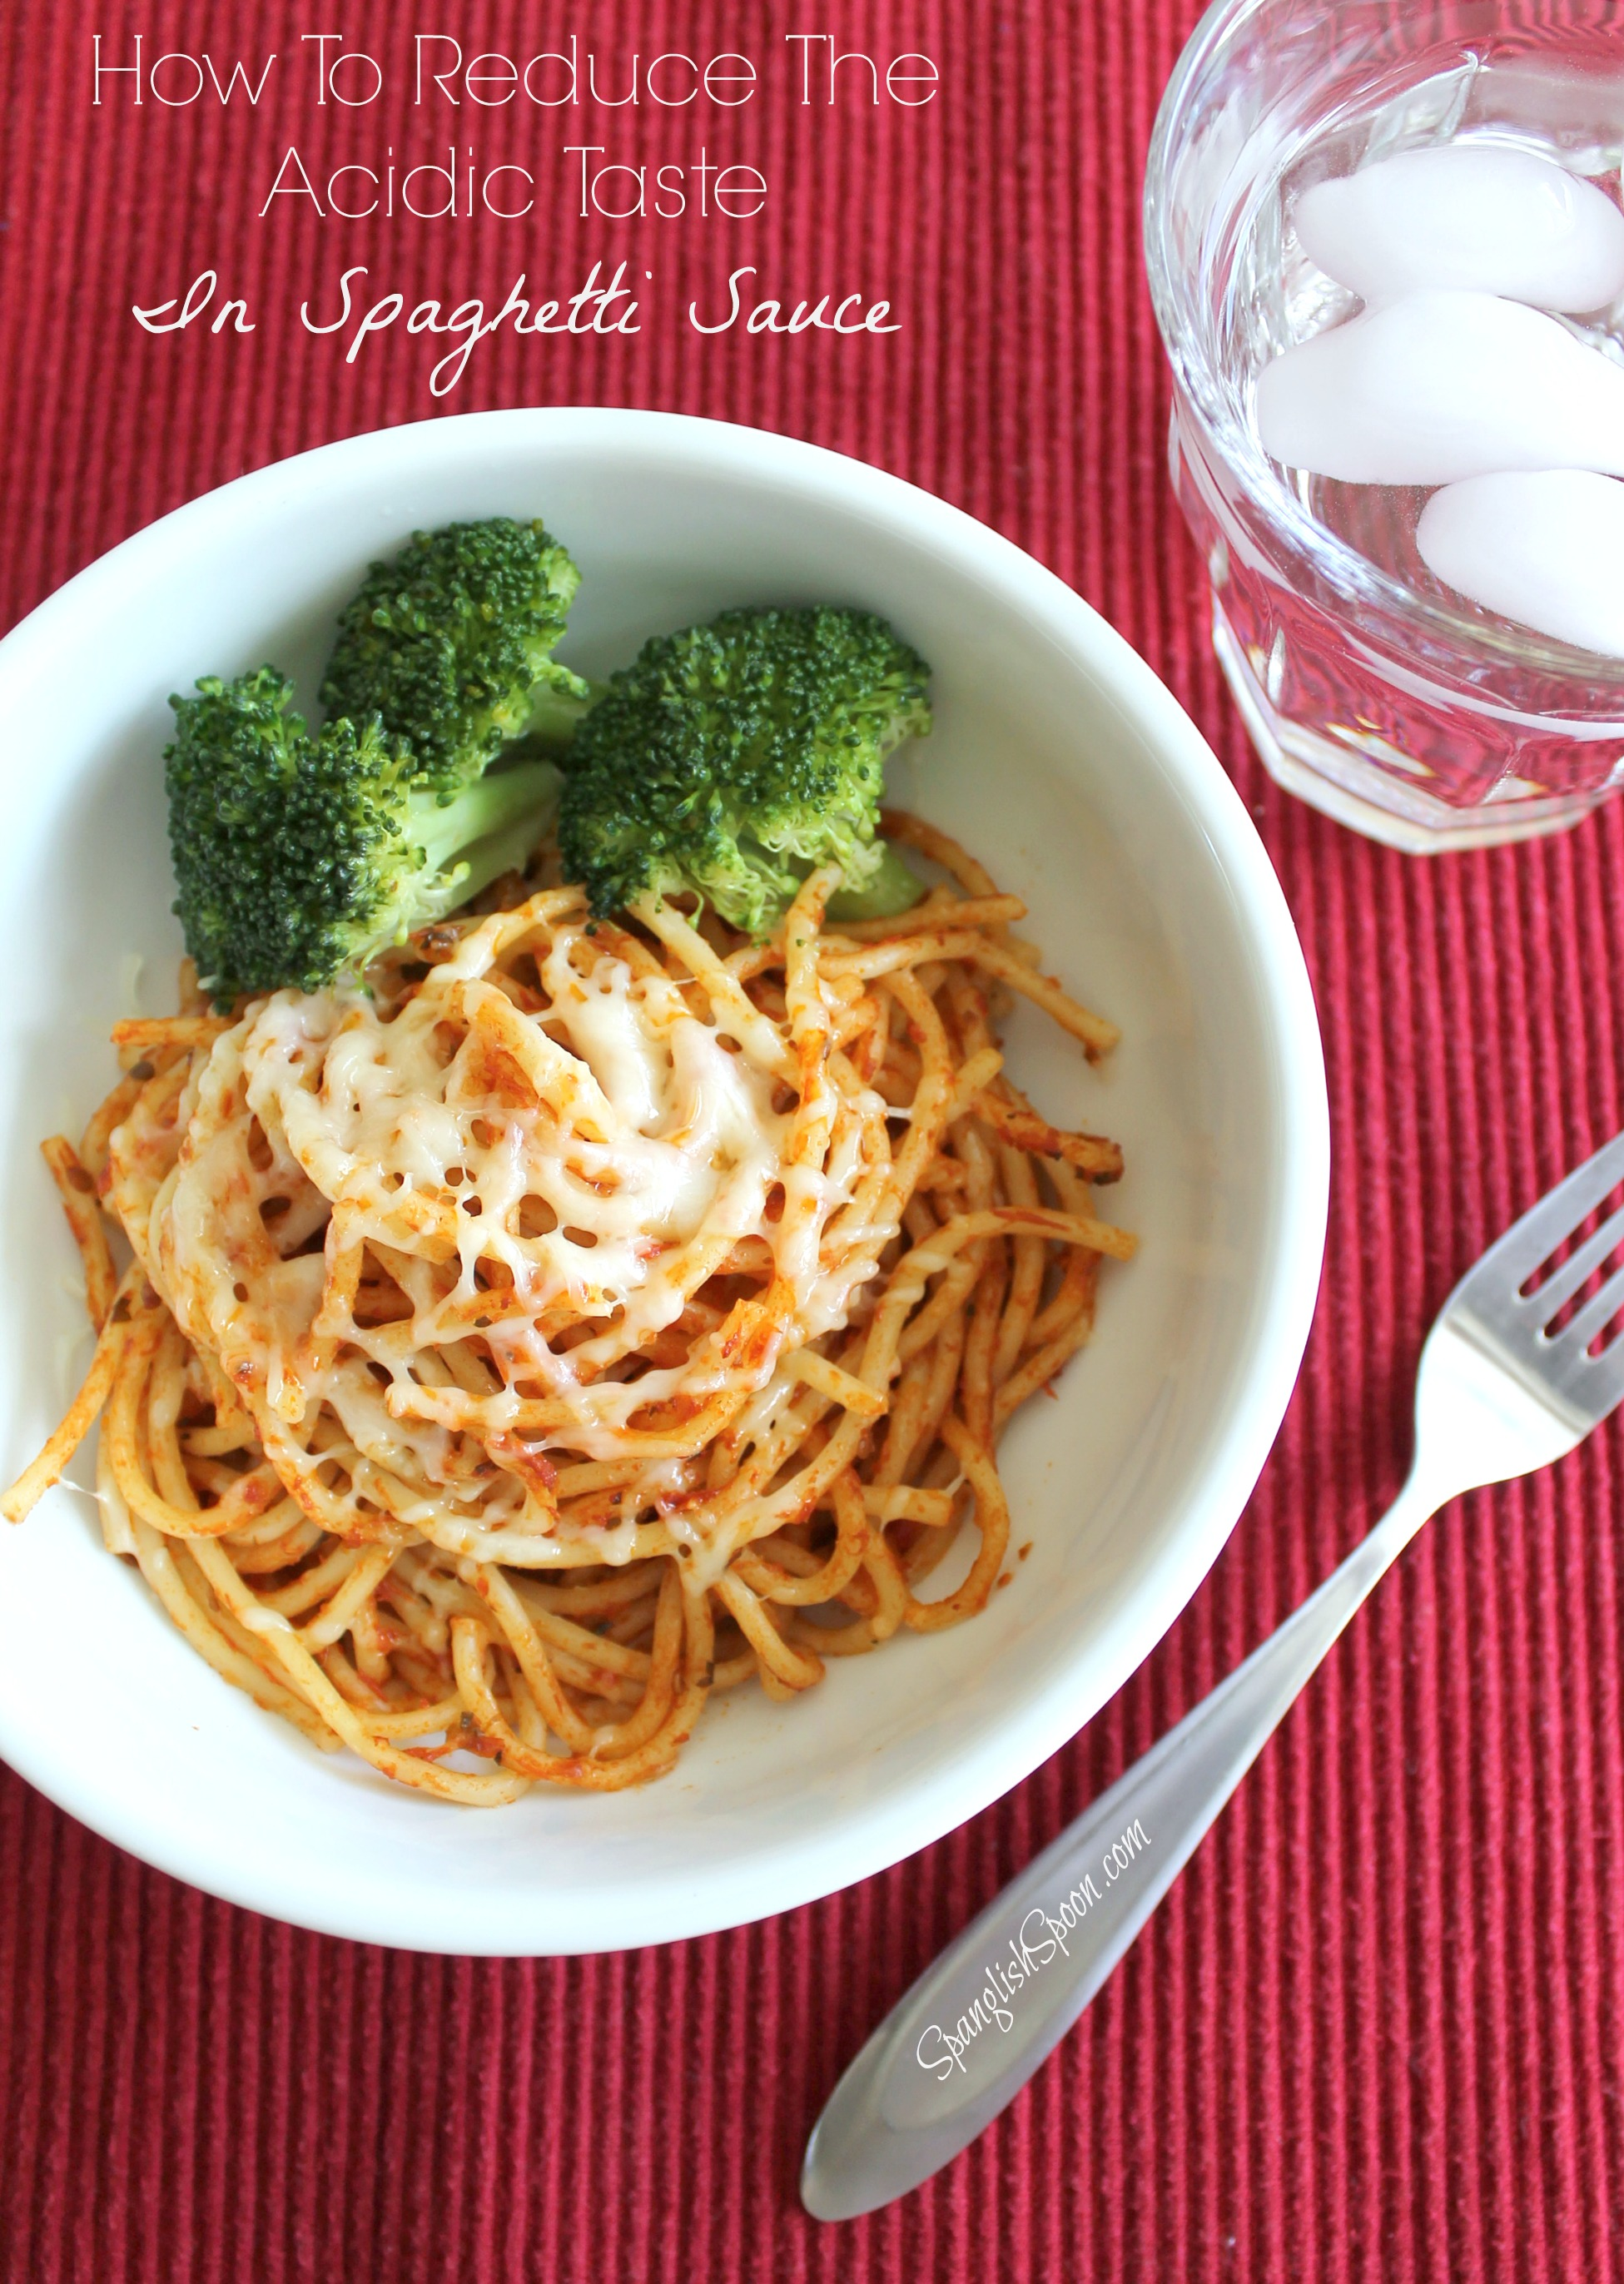 How to reduce the acidic taste in spaghetti sauce 15.2